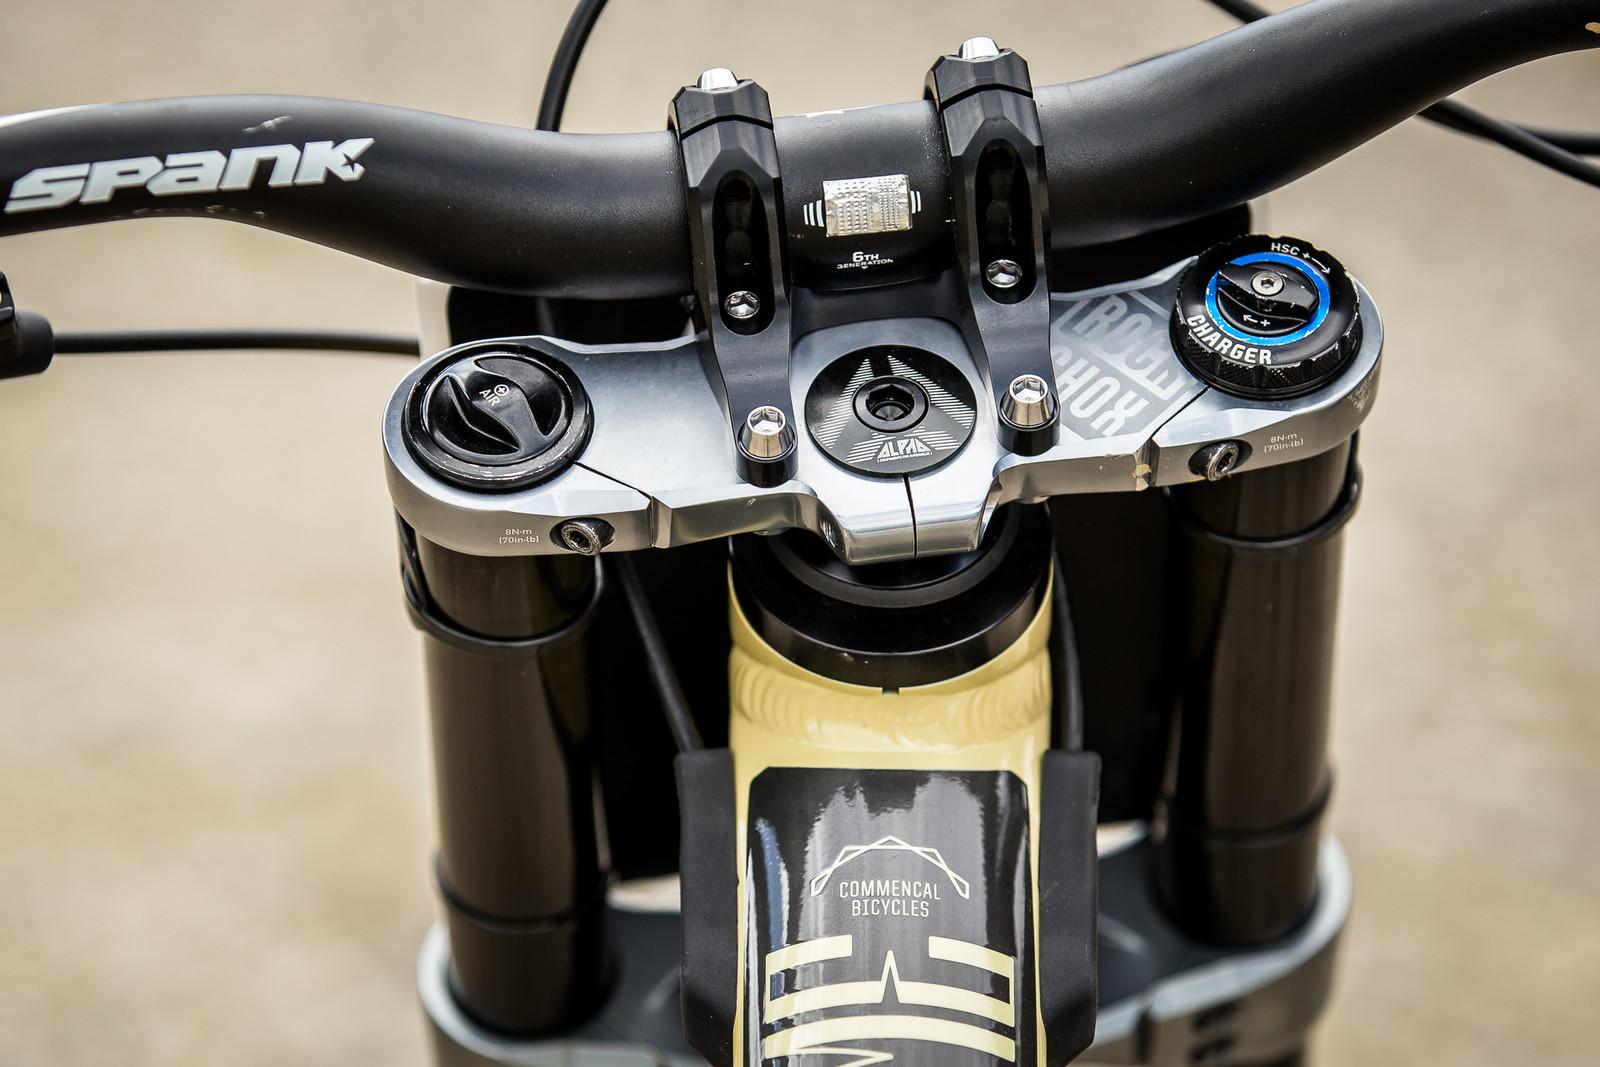 Cockpit - WINNING BIKE - Amaury Pierron's Commencal Supreme DH 29 - Mountain Biking Pictures - Vital MTB